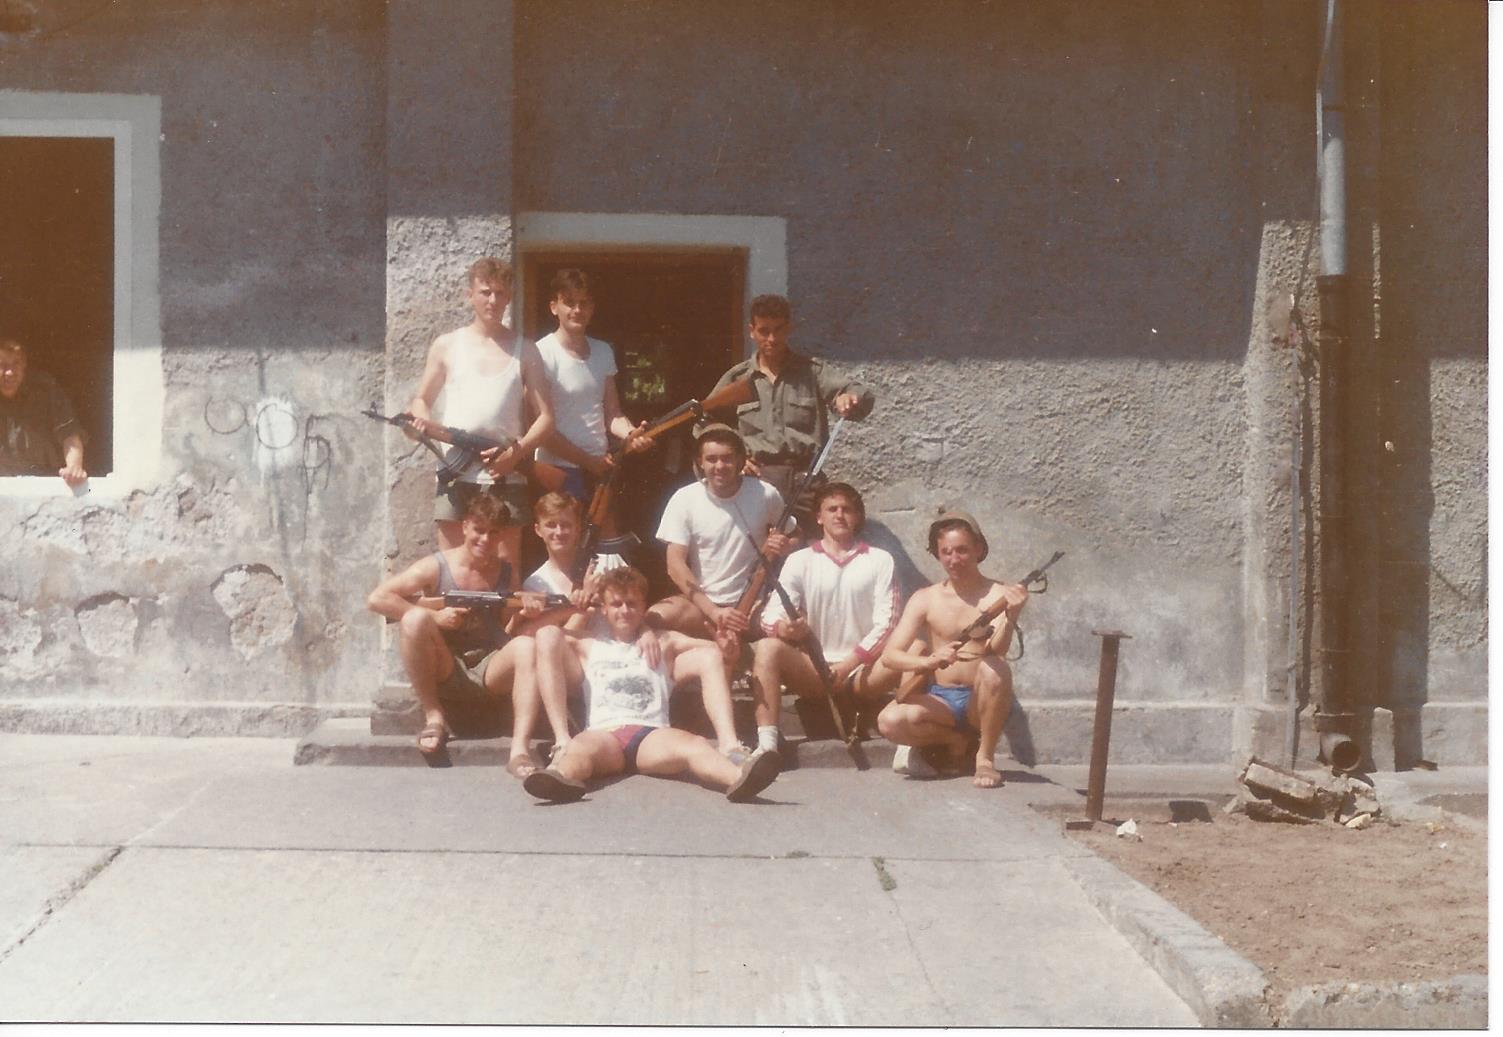 Novi Sad Dunavac VP1756 i 4219-1 1989/90 1zlgpq1